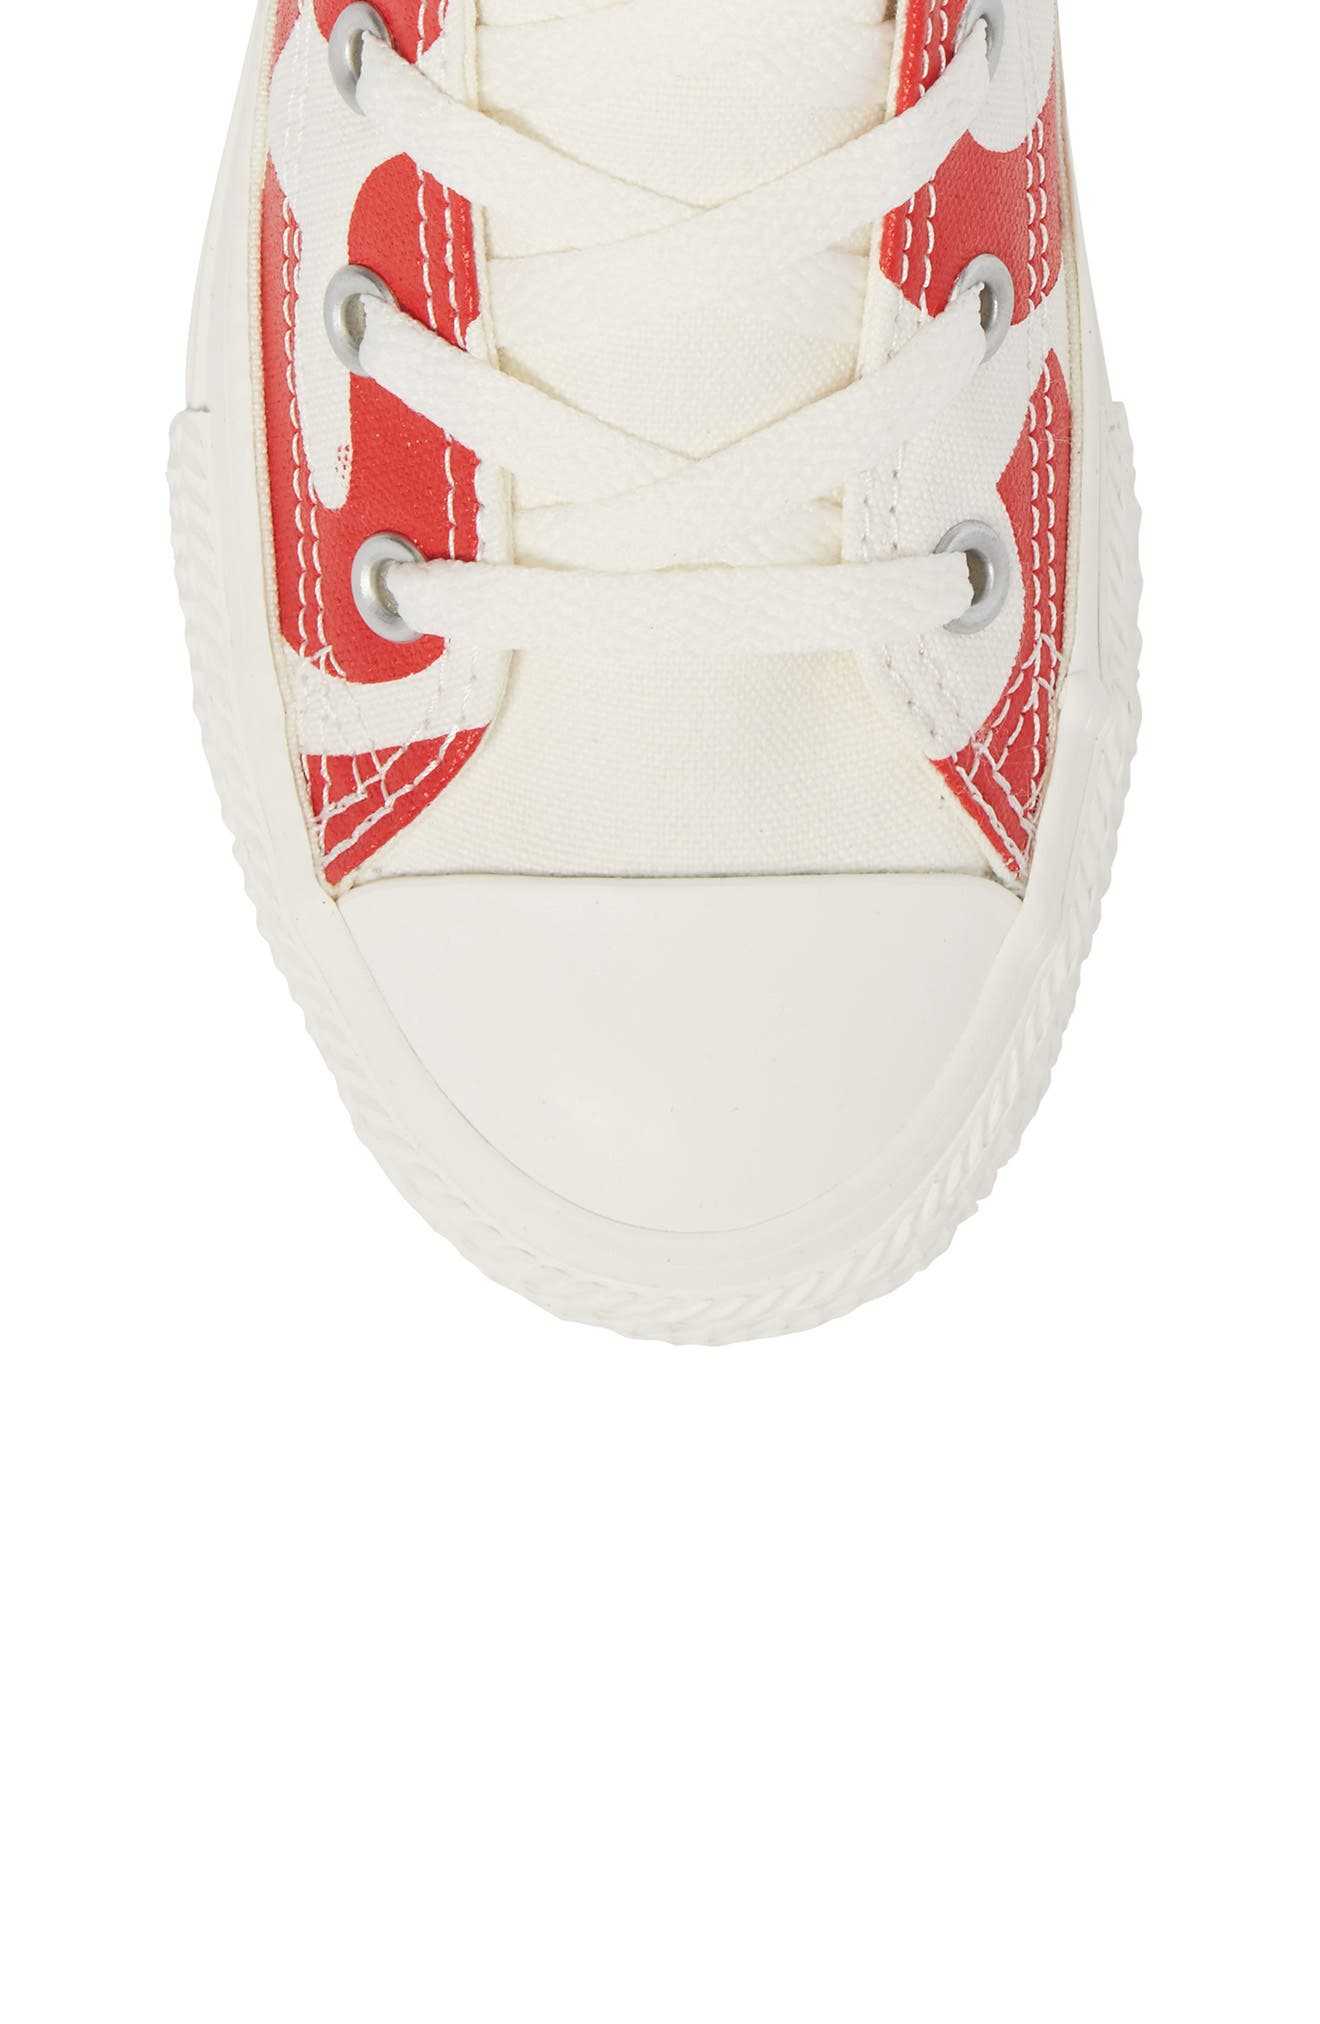 Chuck Taylor<sup>®</sup> All Star<sup>®</sup> Wordmark Hi Sneaker,                             Alternate thumbnail 5, color,                             600